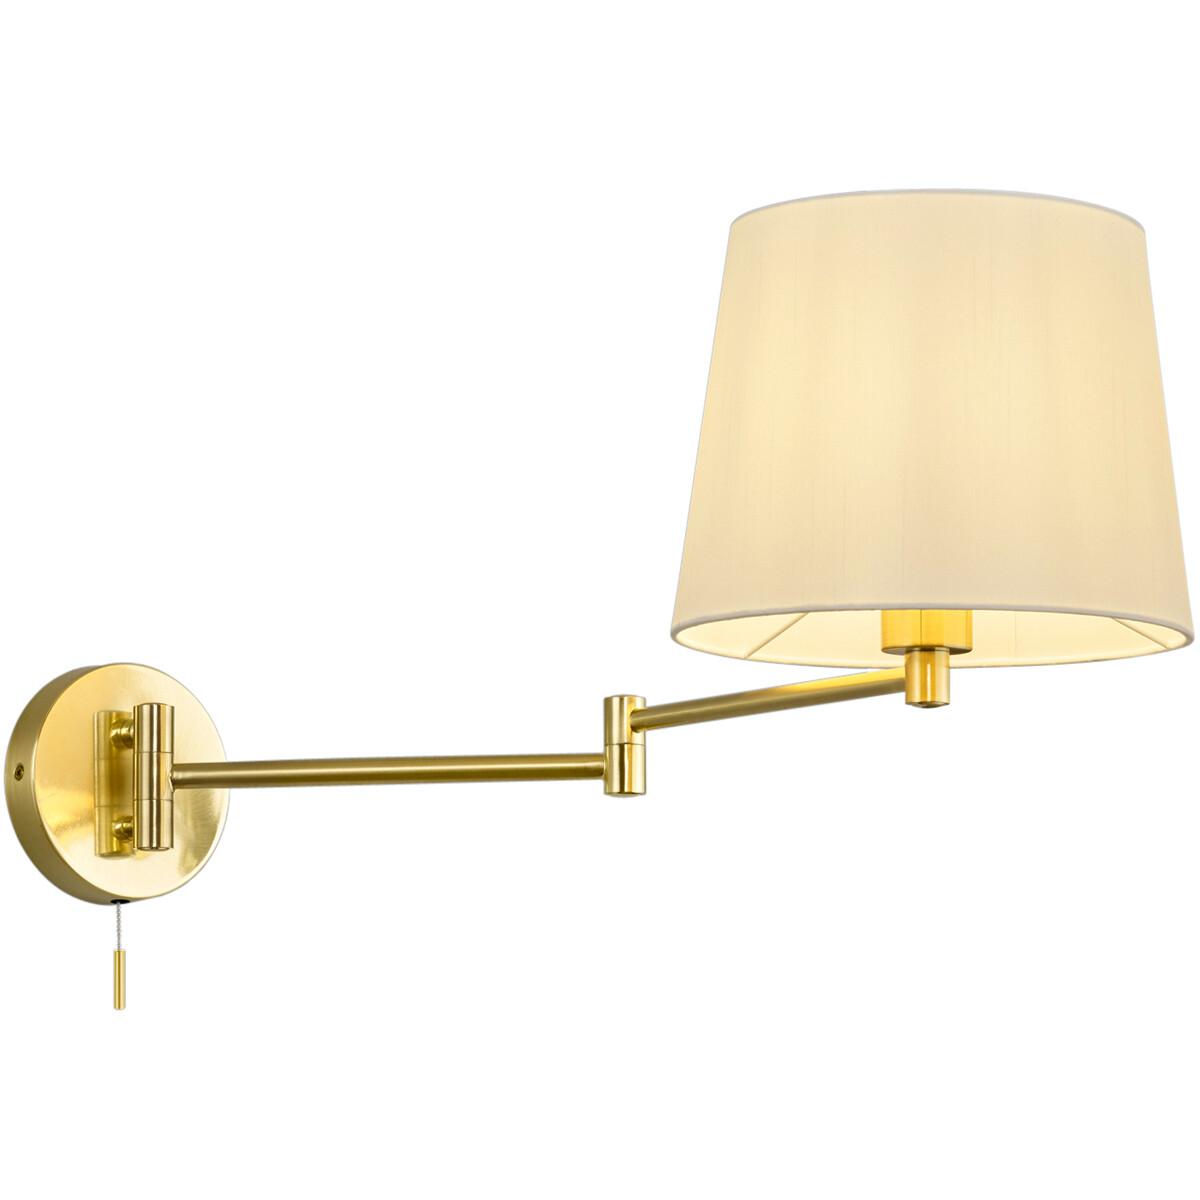 LED Wandlamp - Wandverlichting - Trion Dyon - E27 Fitting - Rond - Mat Goud - Aluminium